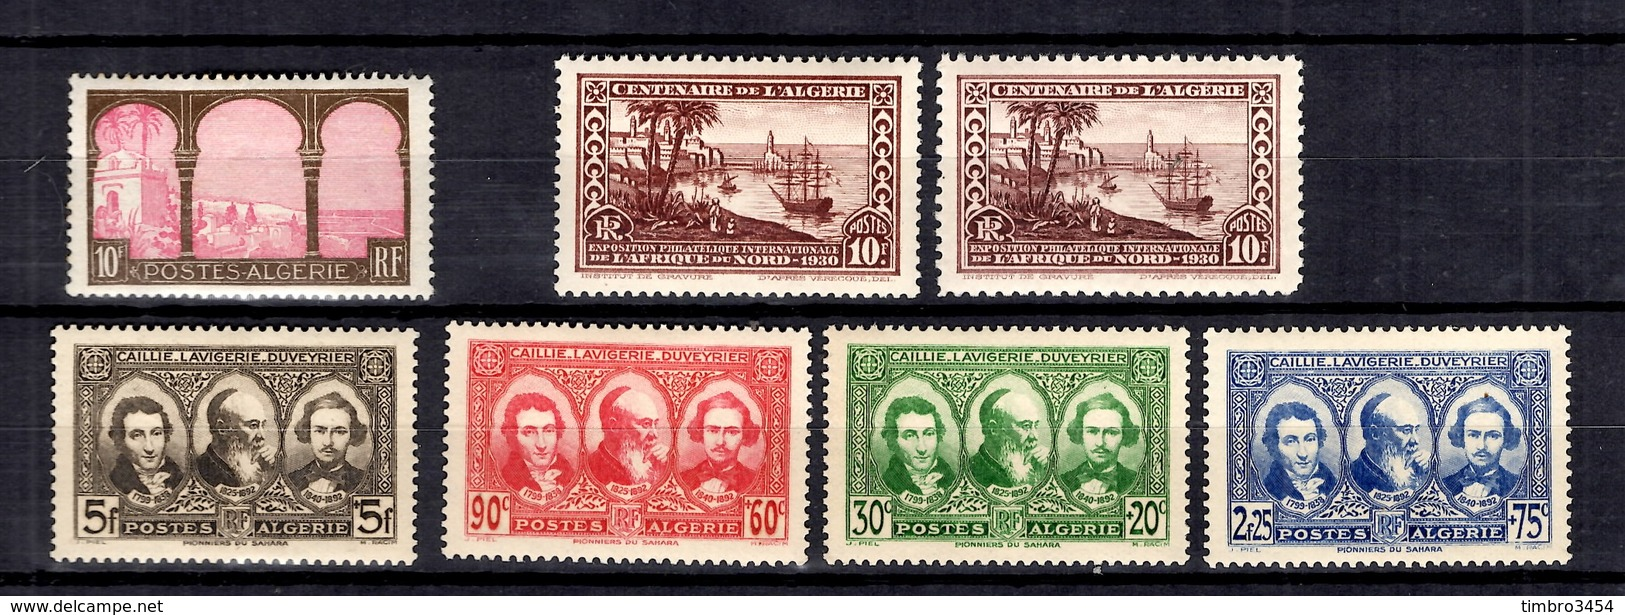 Algérie Maury N° 96, N° 101 (2) Et N° 145/148 Neufs *. B/TB. A Saisir! - Unused Stamps